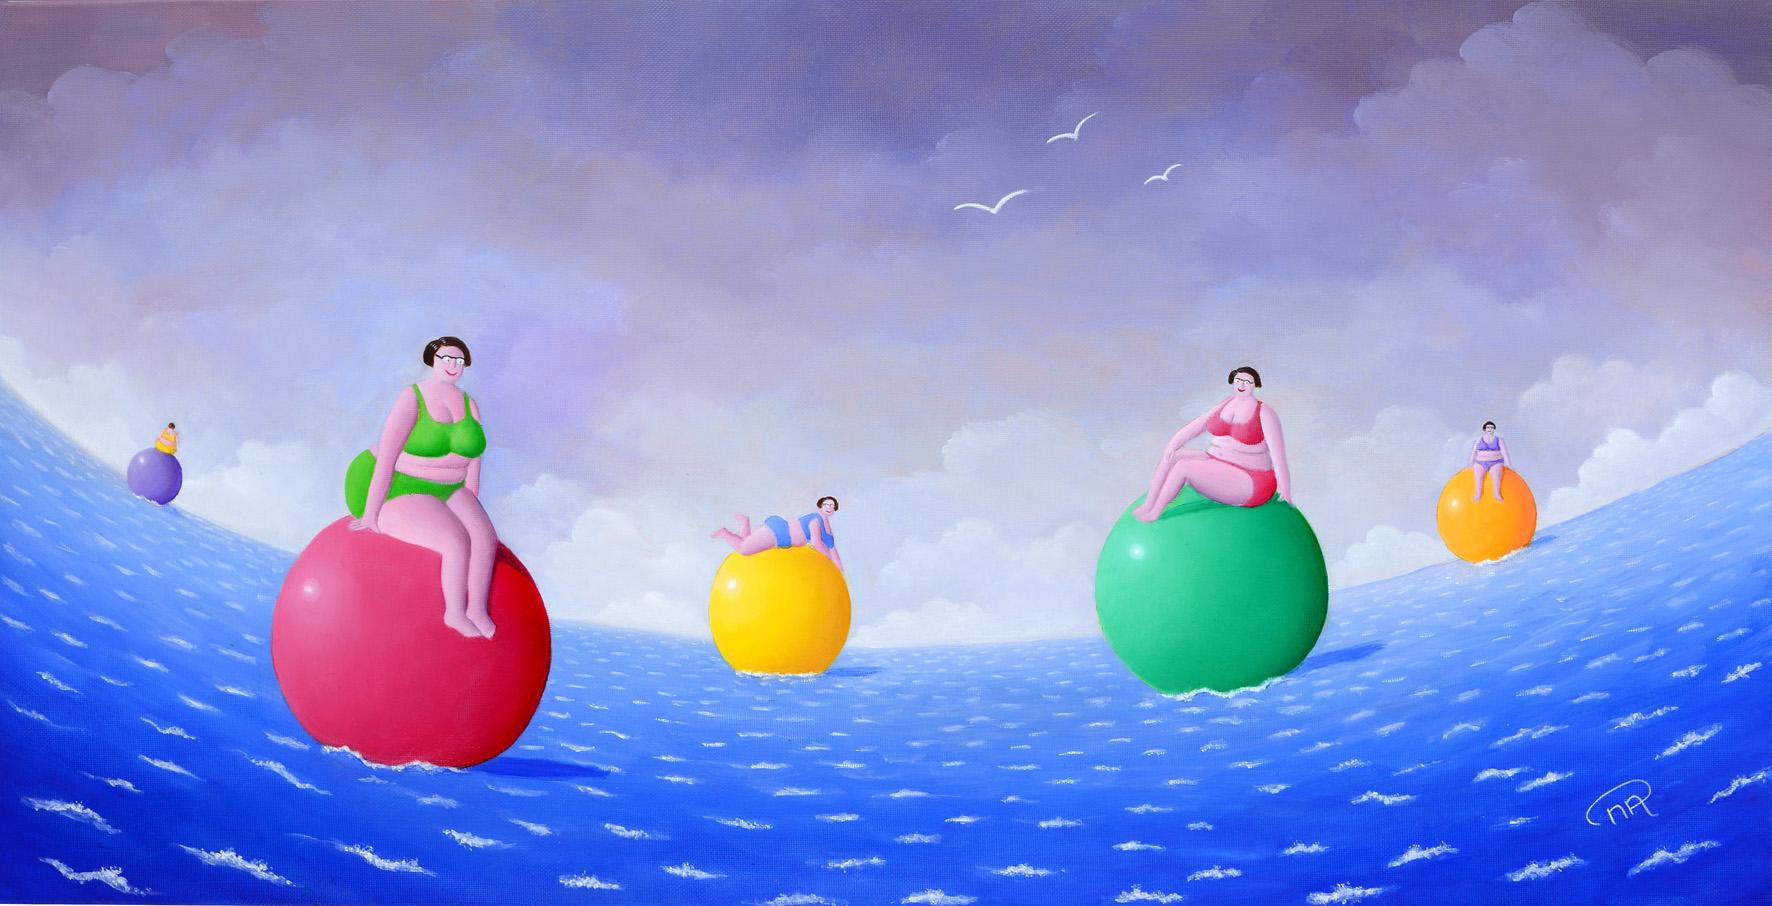 Ballons de mer